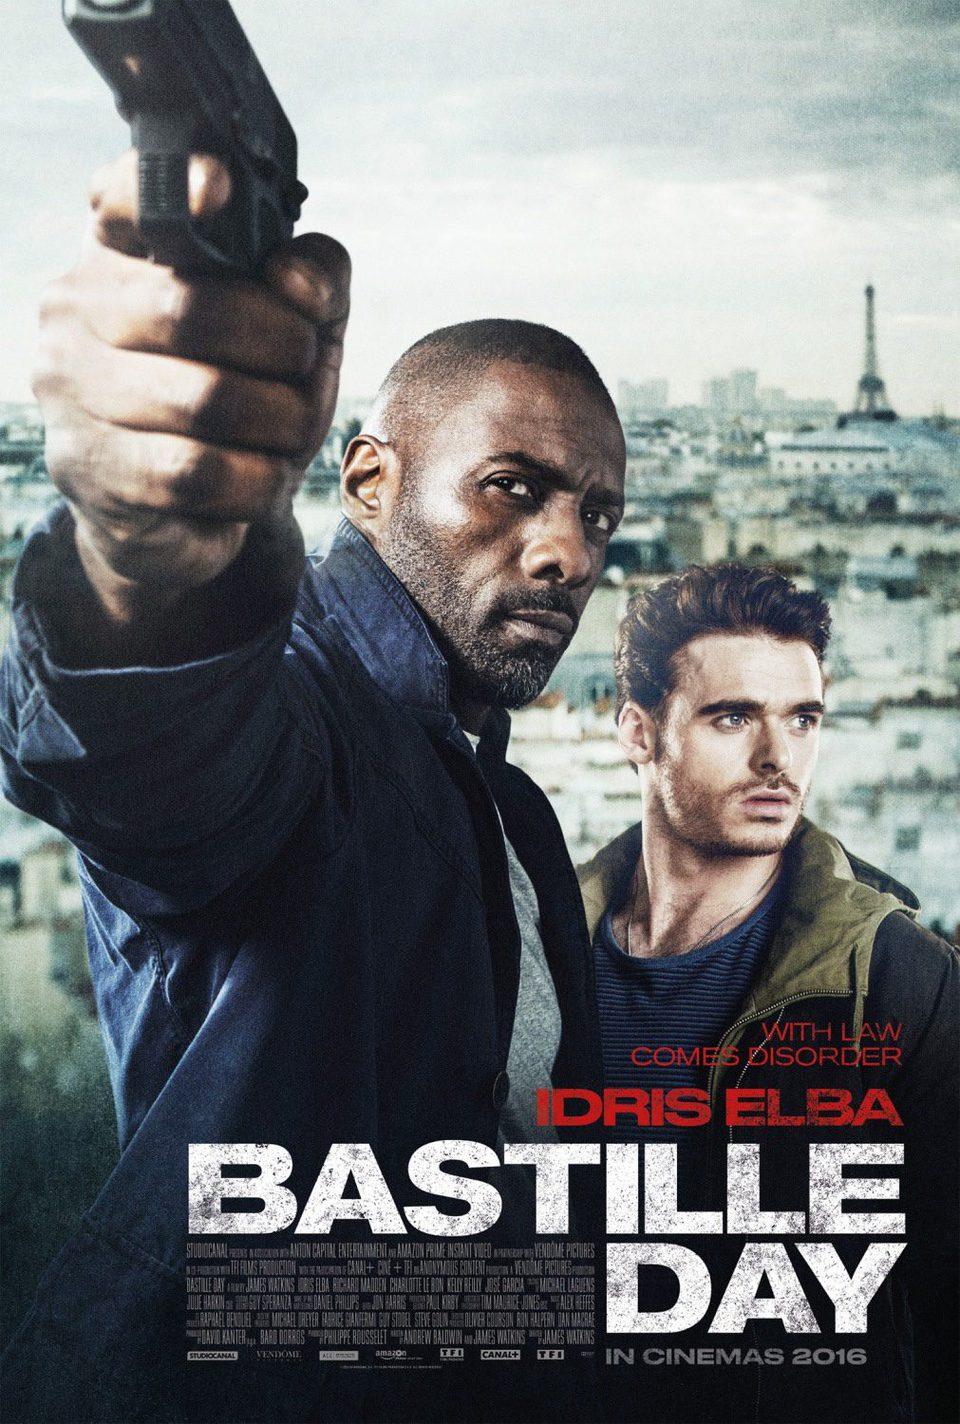 Reino Unido poster for Bastille Day